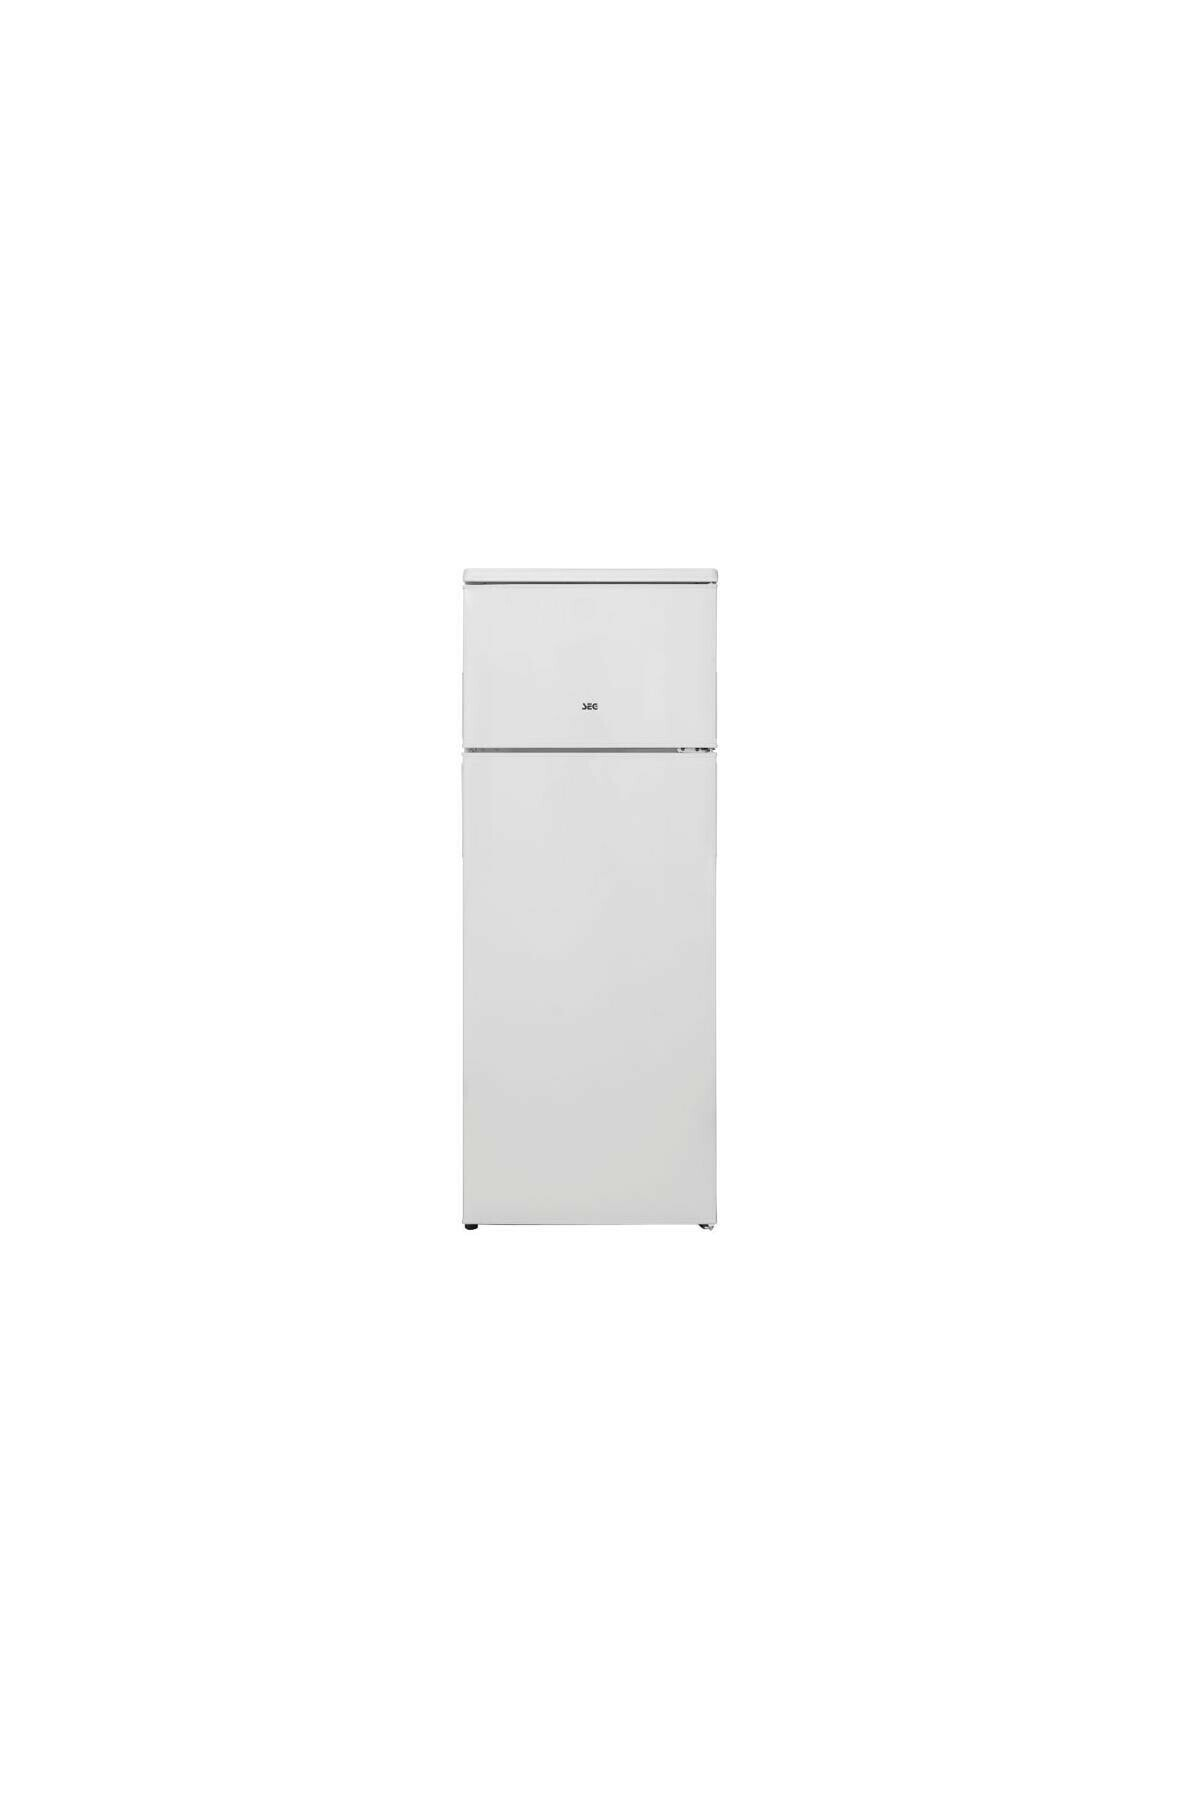 STW 2501 F Enerji Statik Buzdolabı